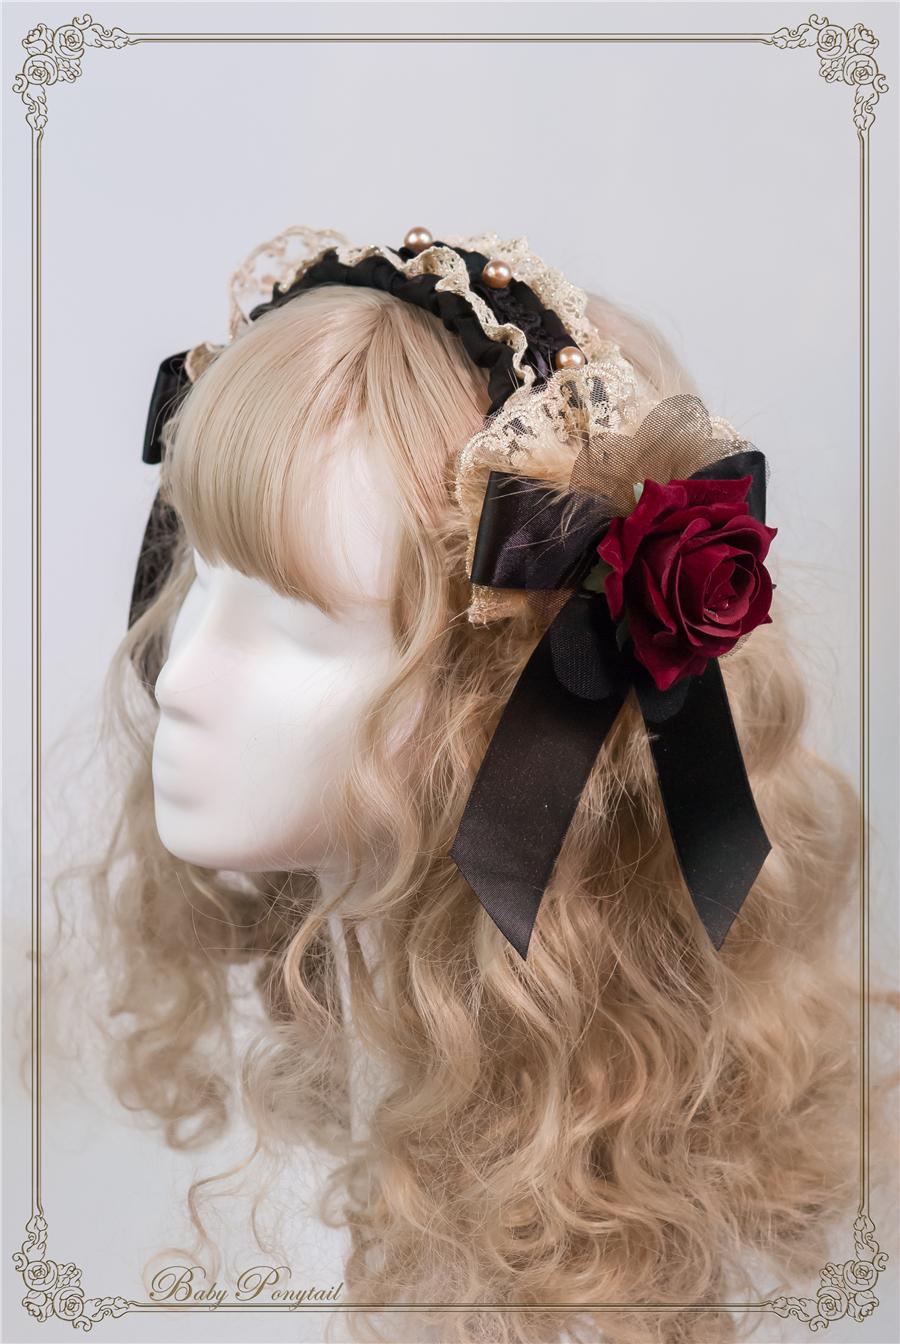 Baby Ponytail_Stock photo_Circus Princess_Rose Head Dress Black_01.jpg